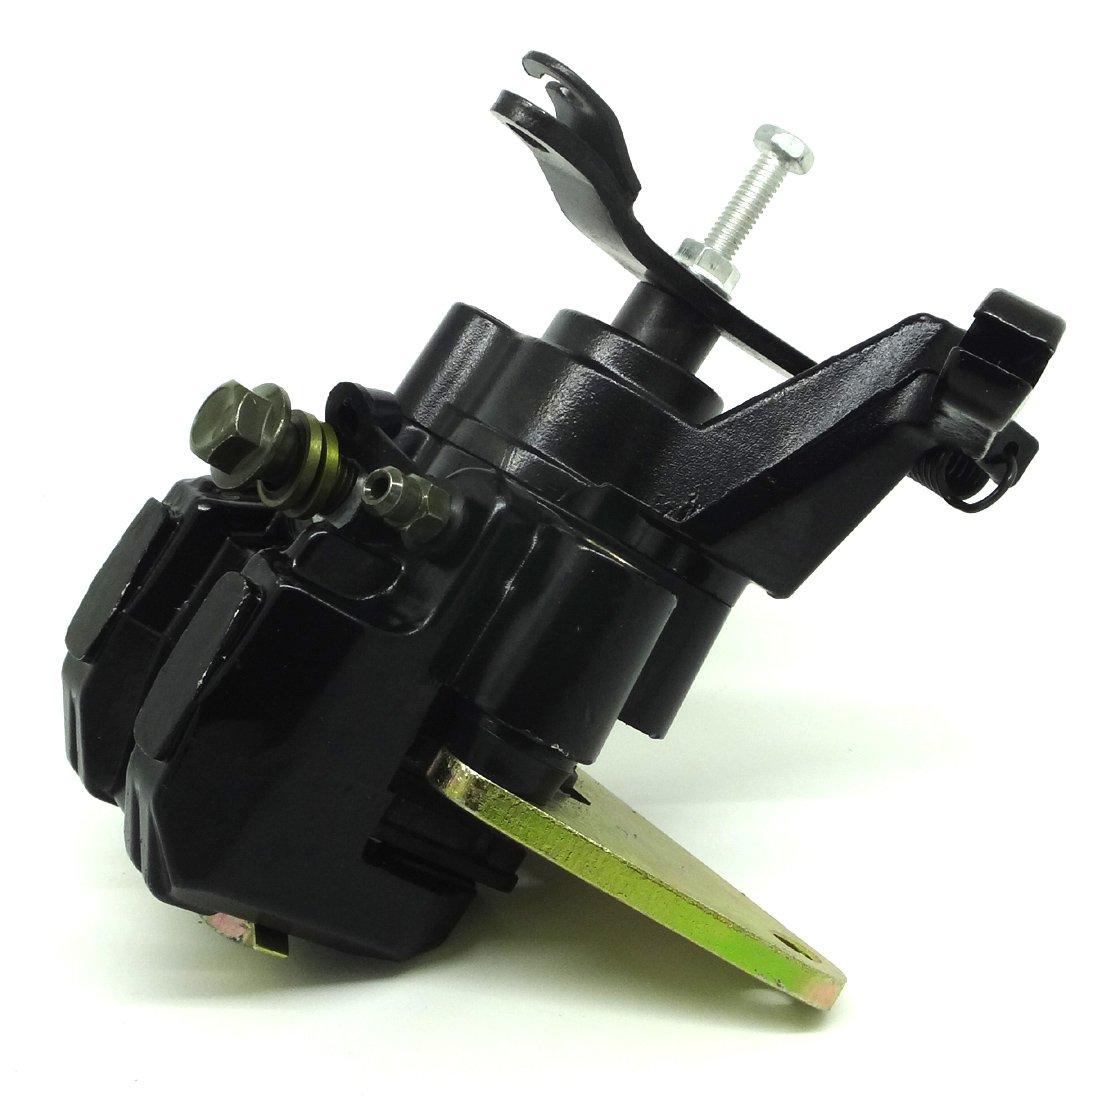 Conpus Rear Brake Caliper Assembly for Suzuki Quad Sport Z400 LTZ 400 with Pads 03-14 2006 Suzuki Quadsport Z400 Ltz400 2X4 A62 by Conpus (Image #4)